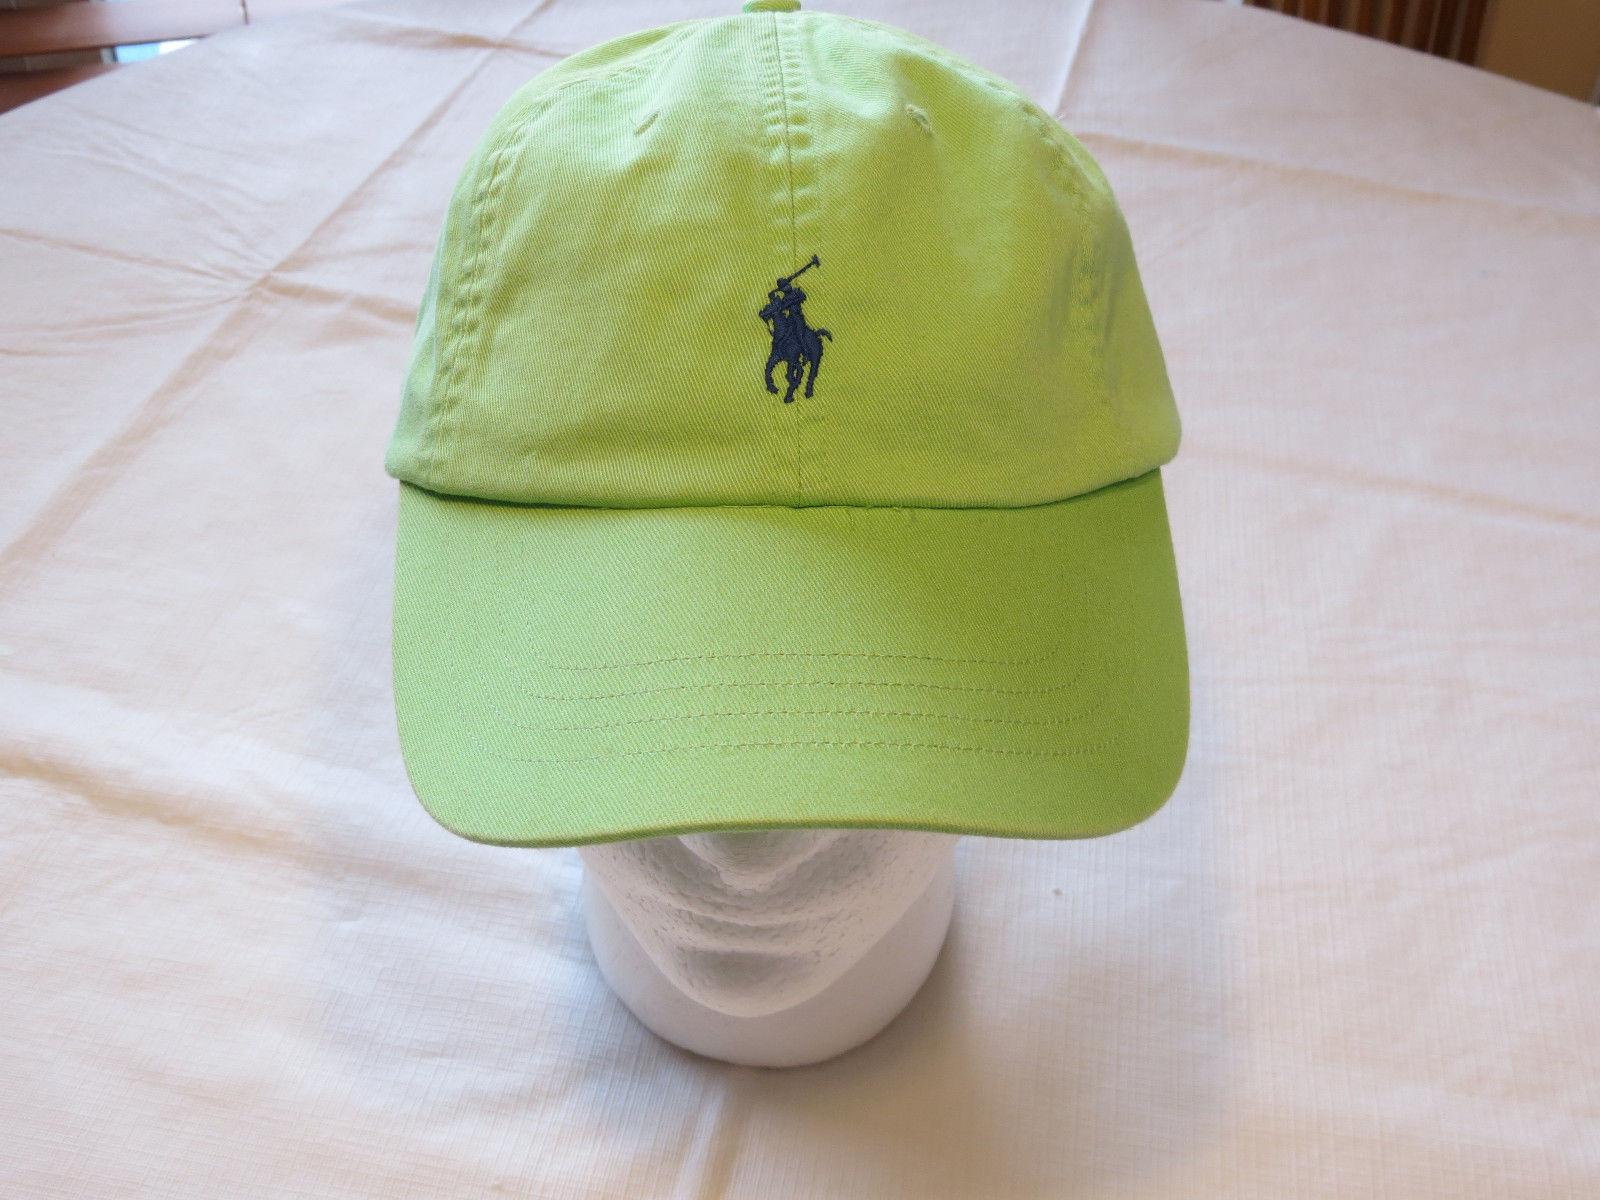 dca0d5a1457 57. 57. Previous. Mens Polo Ralph Lauren hat cap golf casual green blue  331002 adjustable classic · Mens Polo Ralph ...